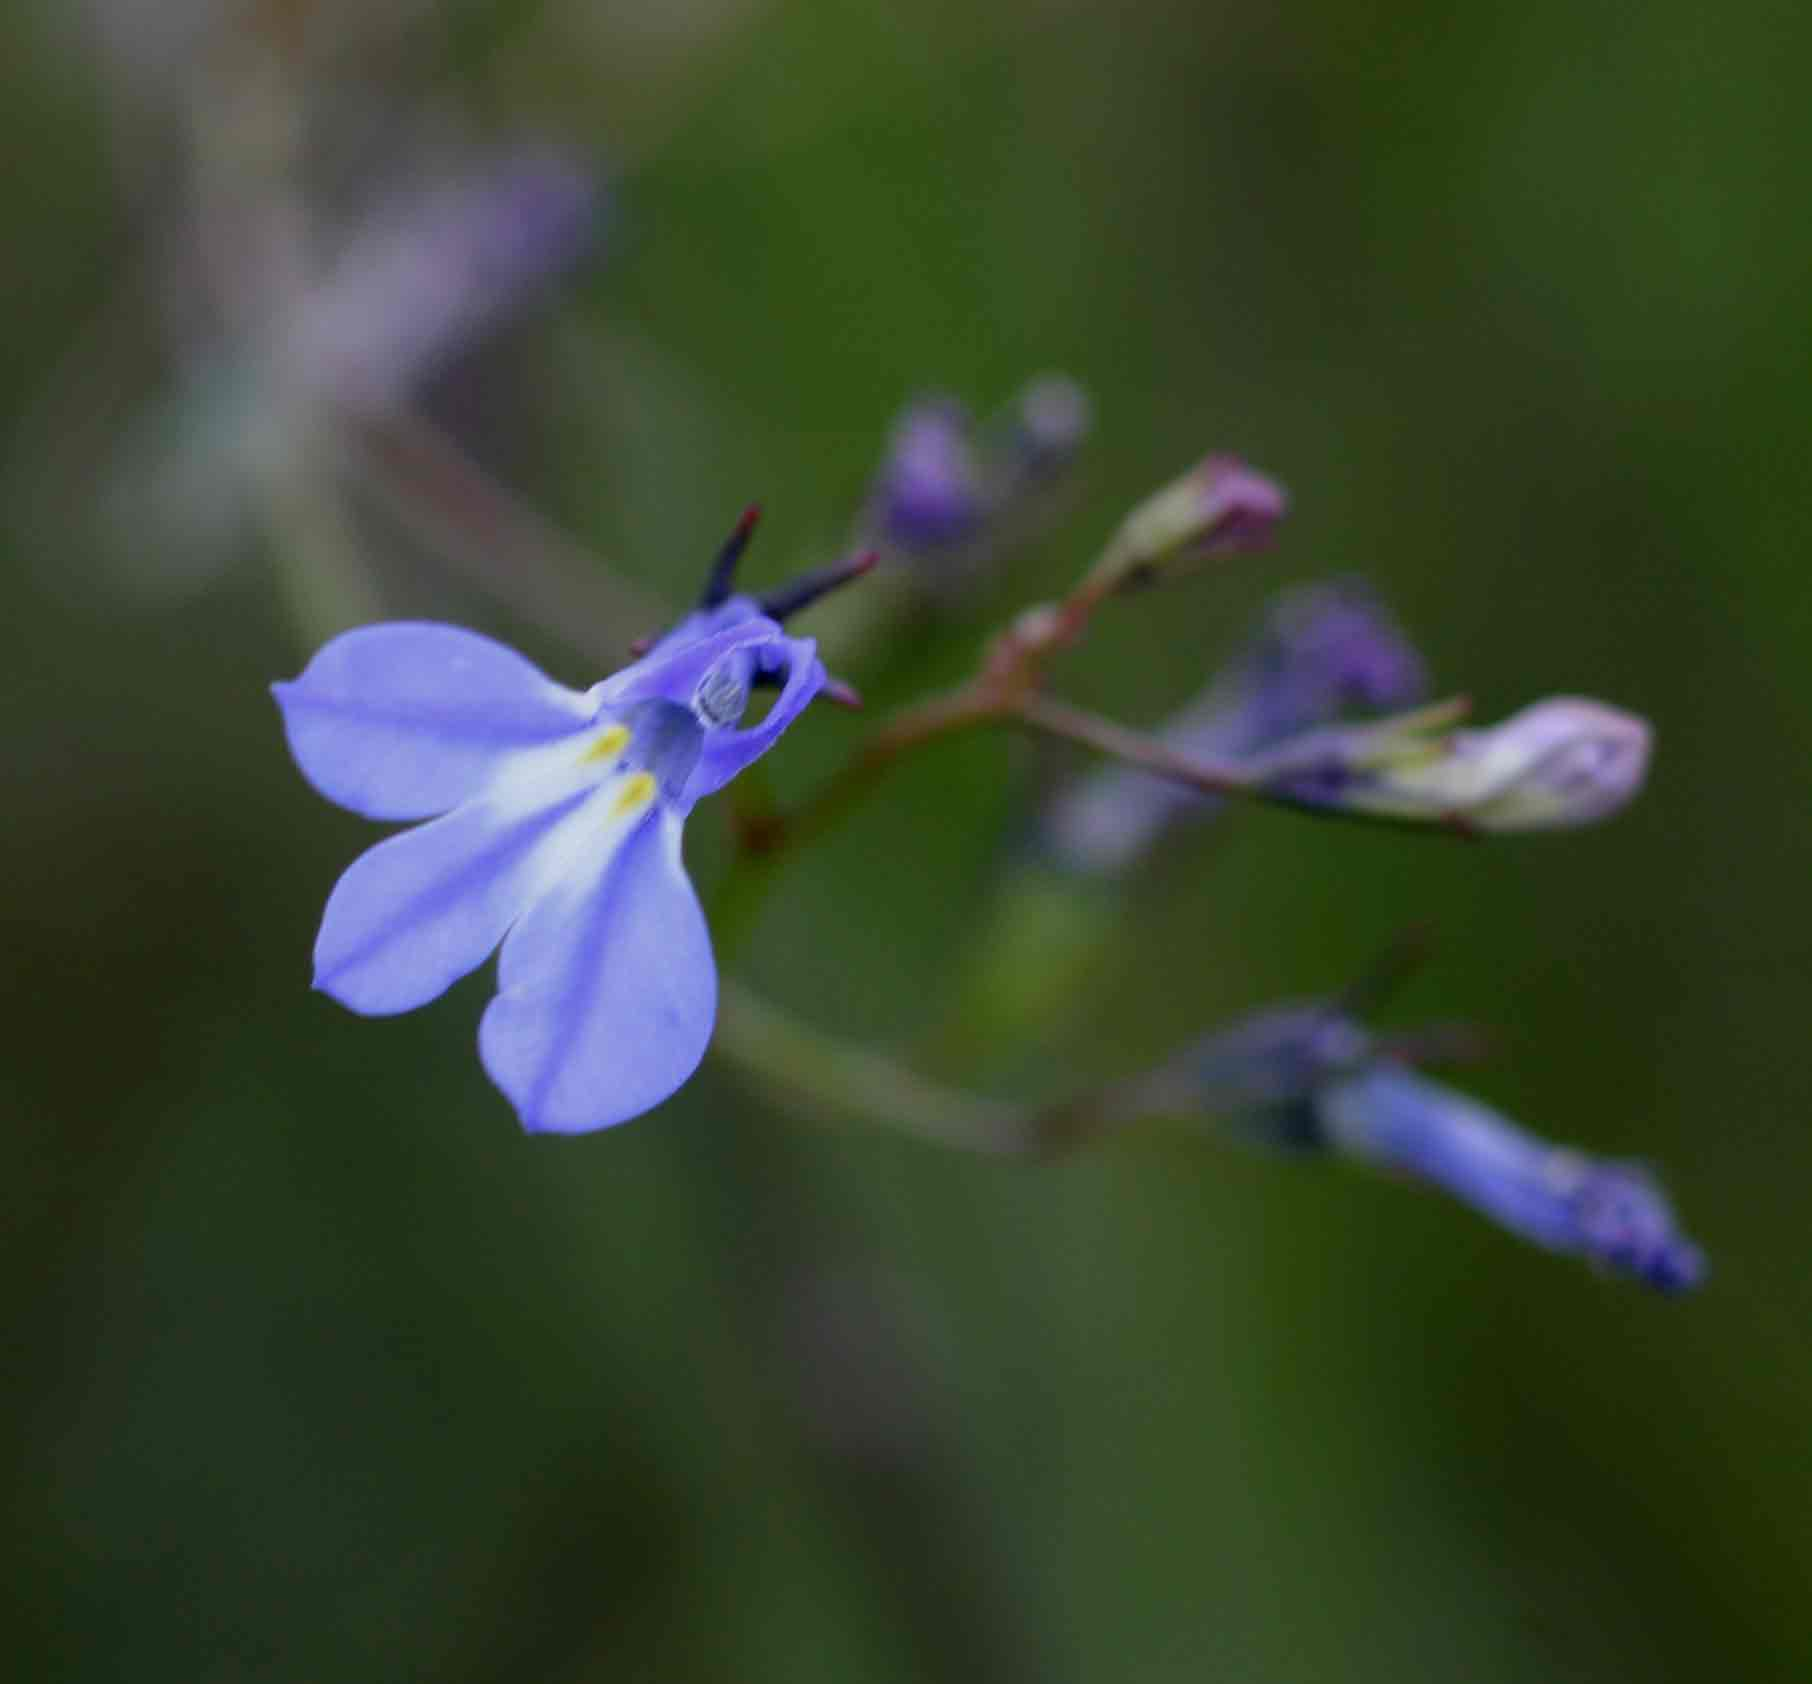 Flora Of Malawi Species Information Individual Images Lobelia Erinus